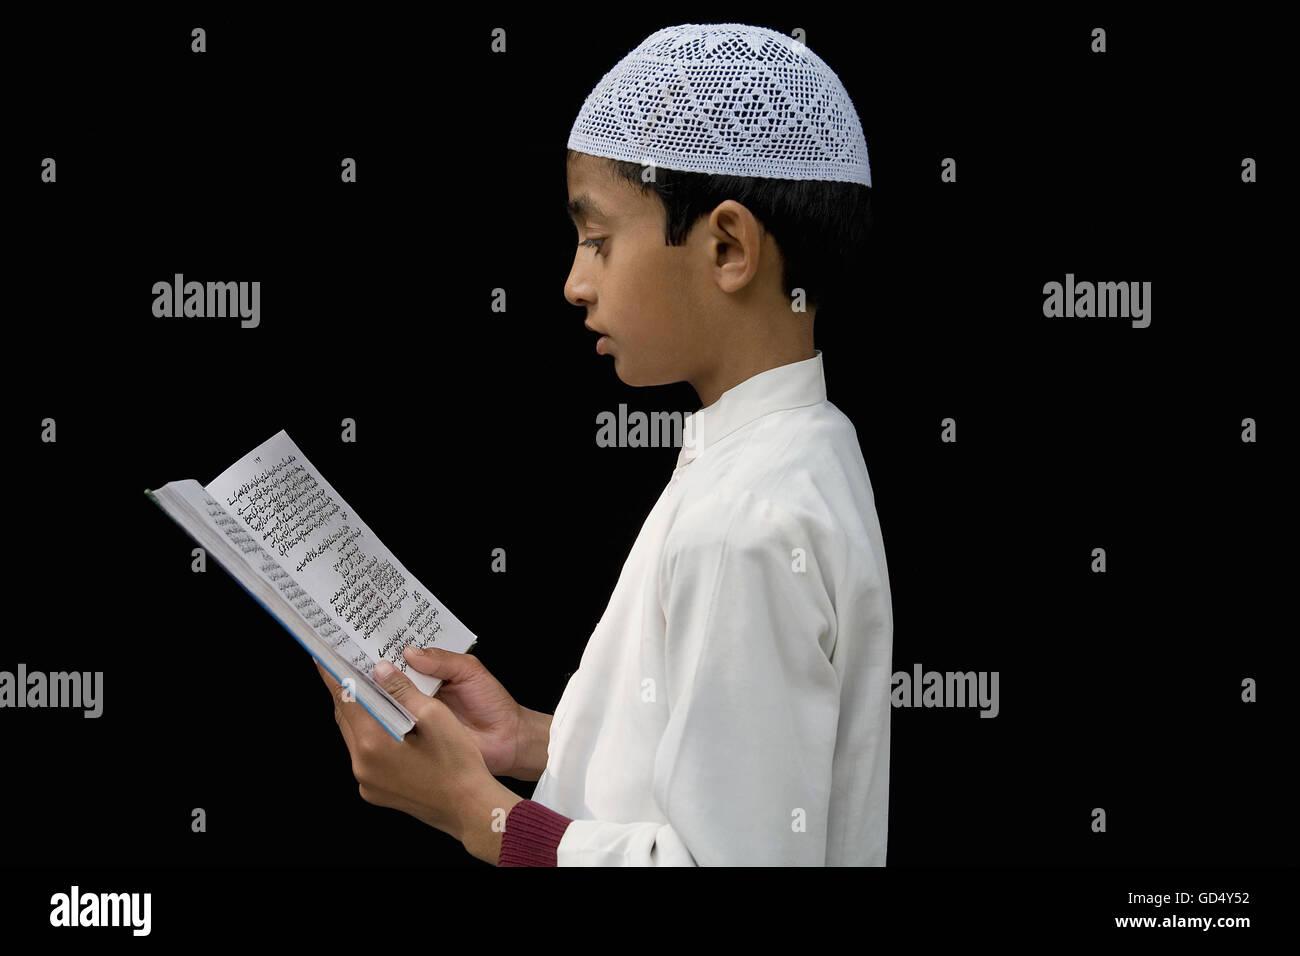 Boy Reading Quran - Stock Image